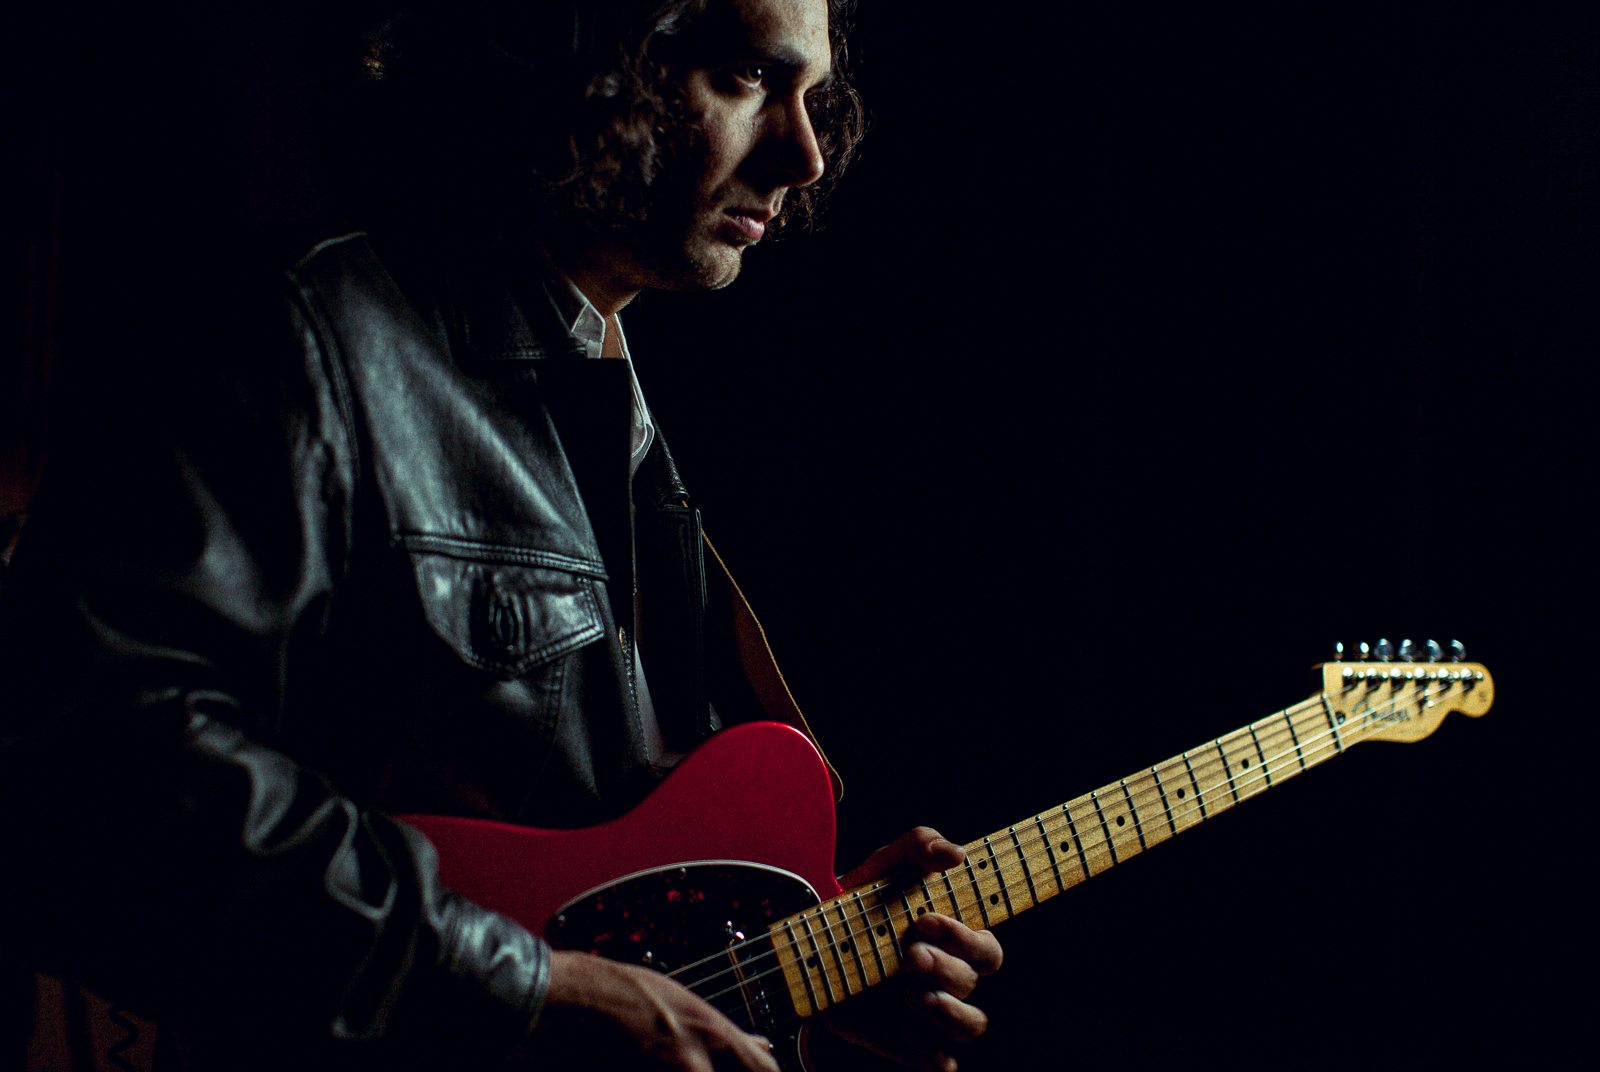 M Greco guitar.jpg